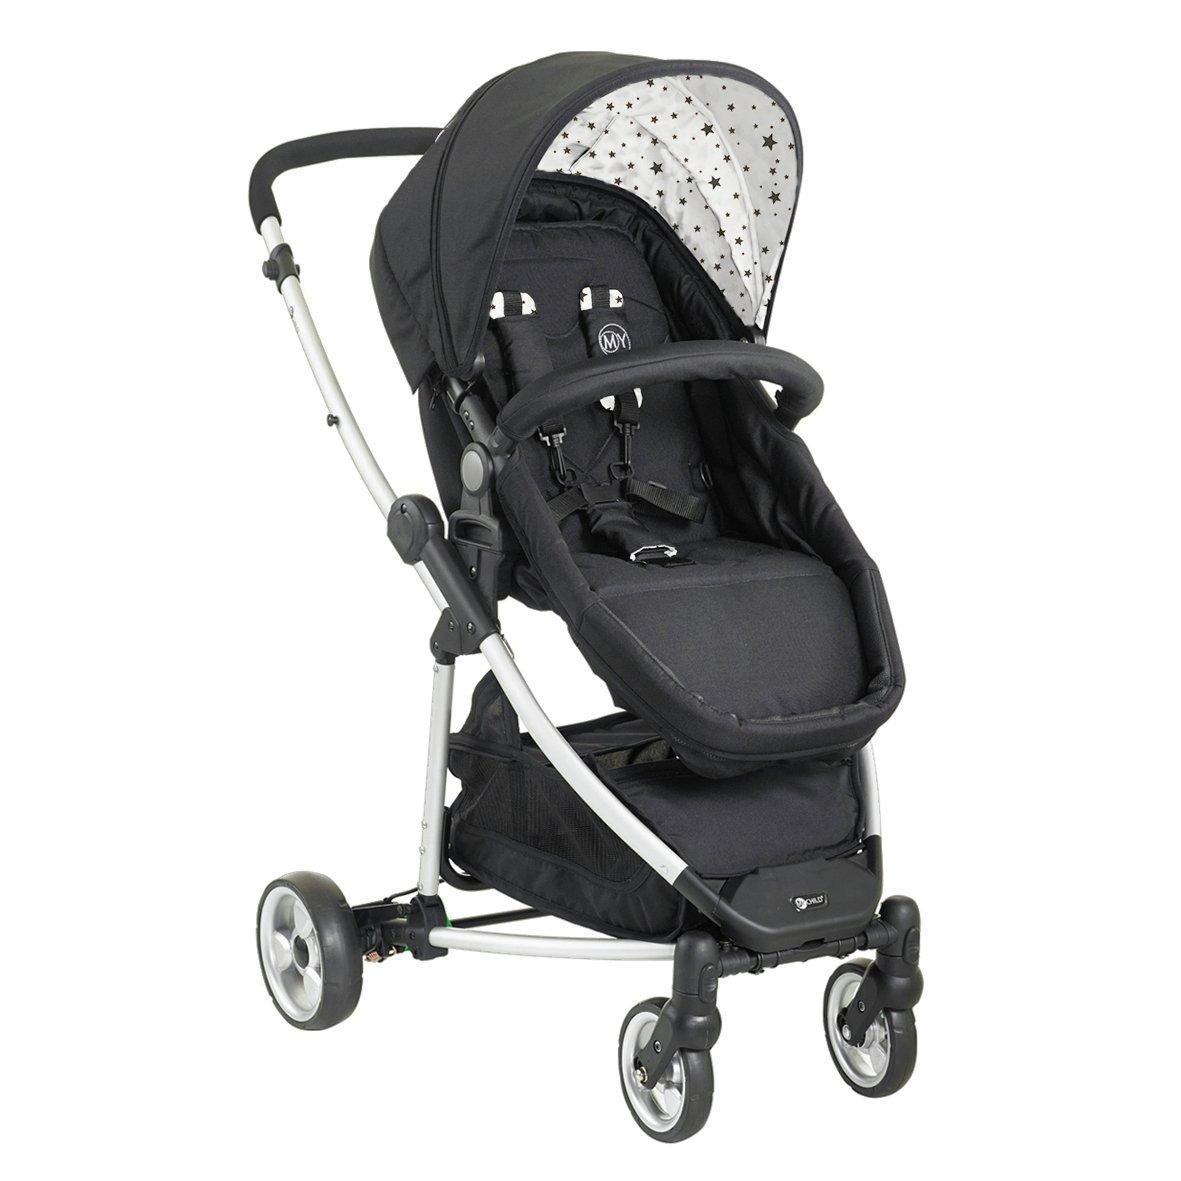 MyChild Floe Convertible Stroller - Black